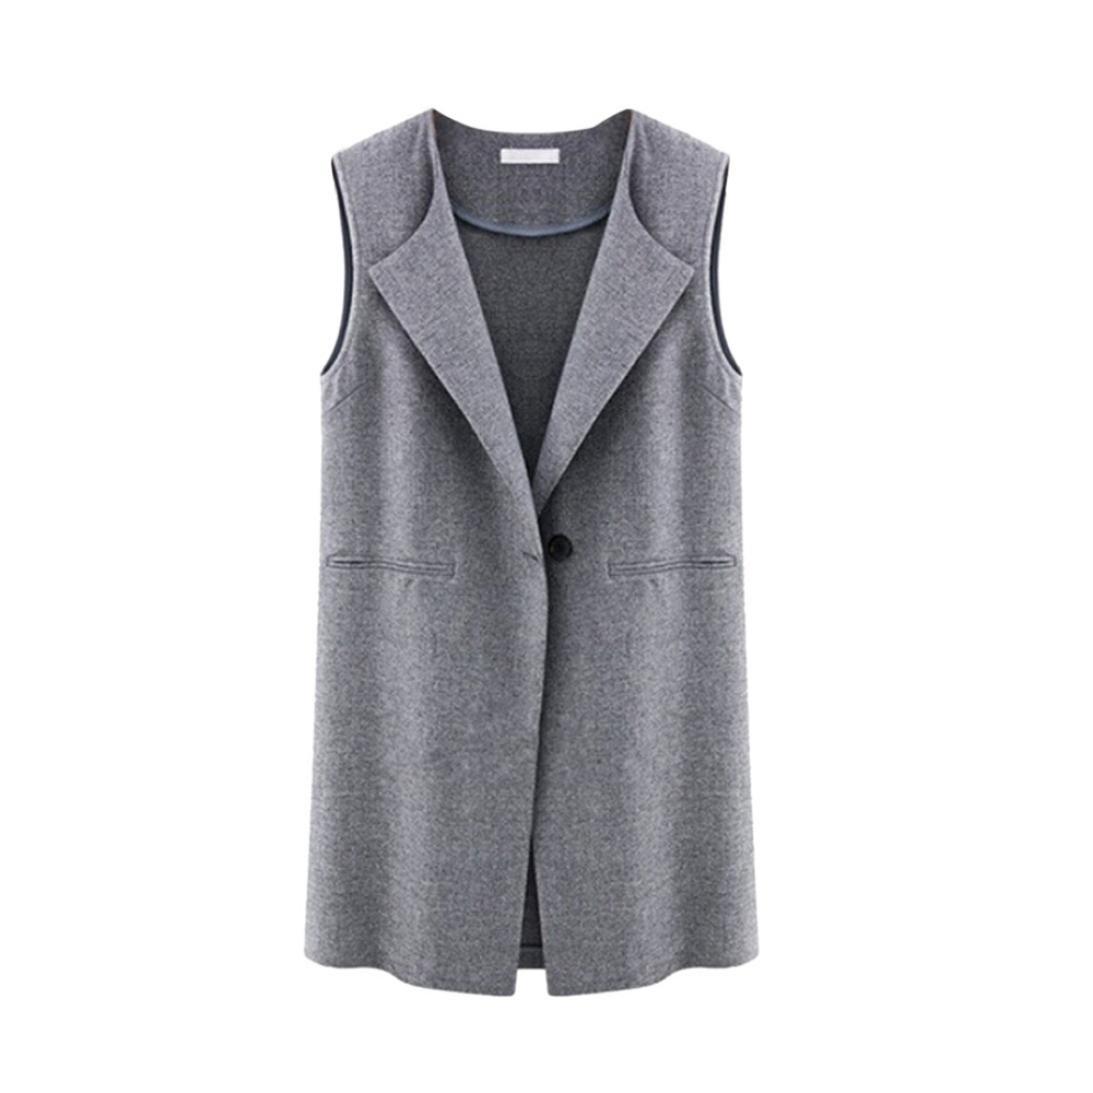 Sonnena para mujer sin mangas chaqueta abrigo largo cardigan de Gilets chaleco outwear Coat Cardigan...